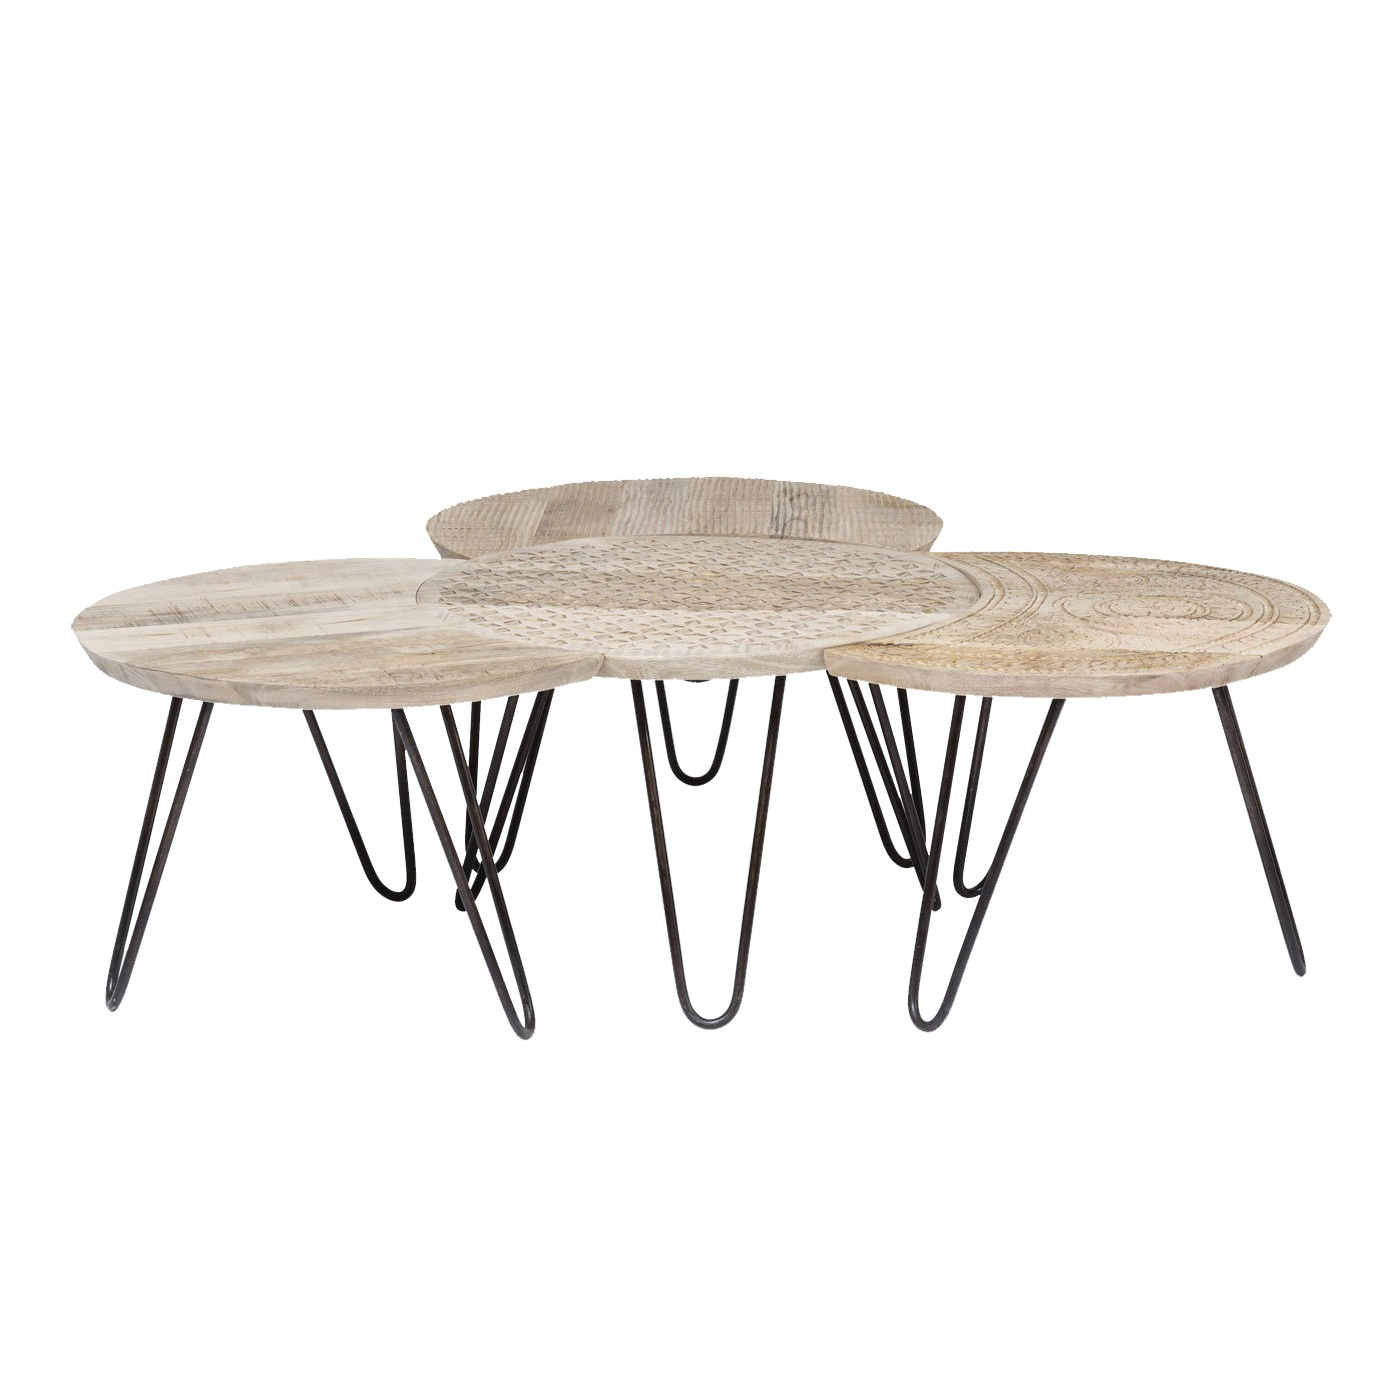 4 tables basses en manguier massif sculpté